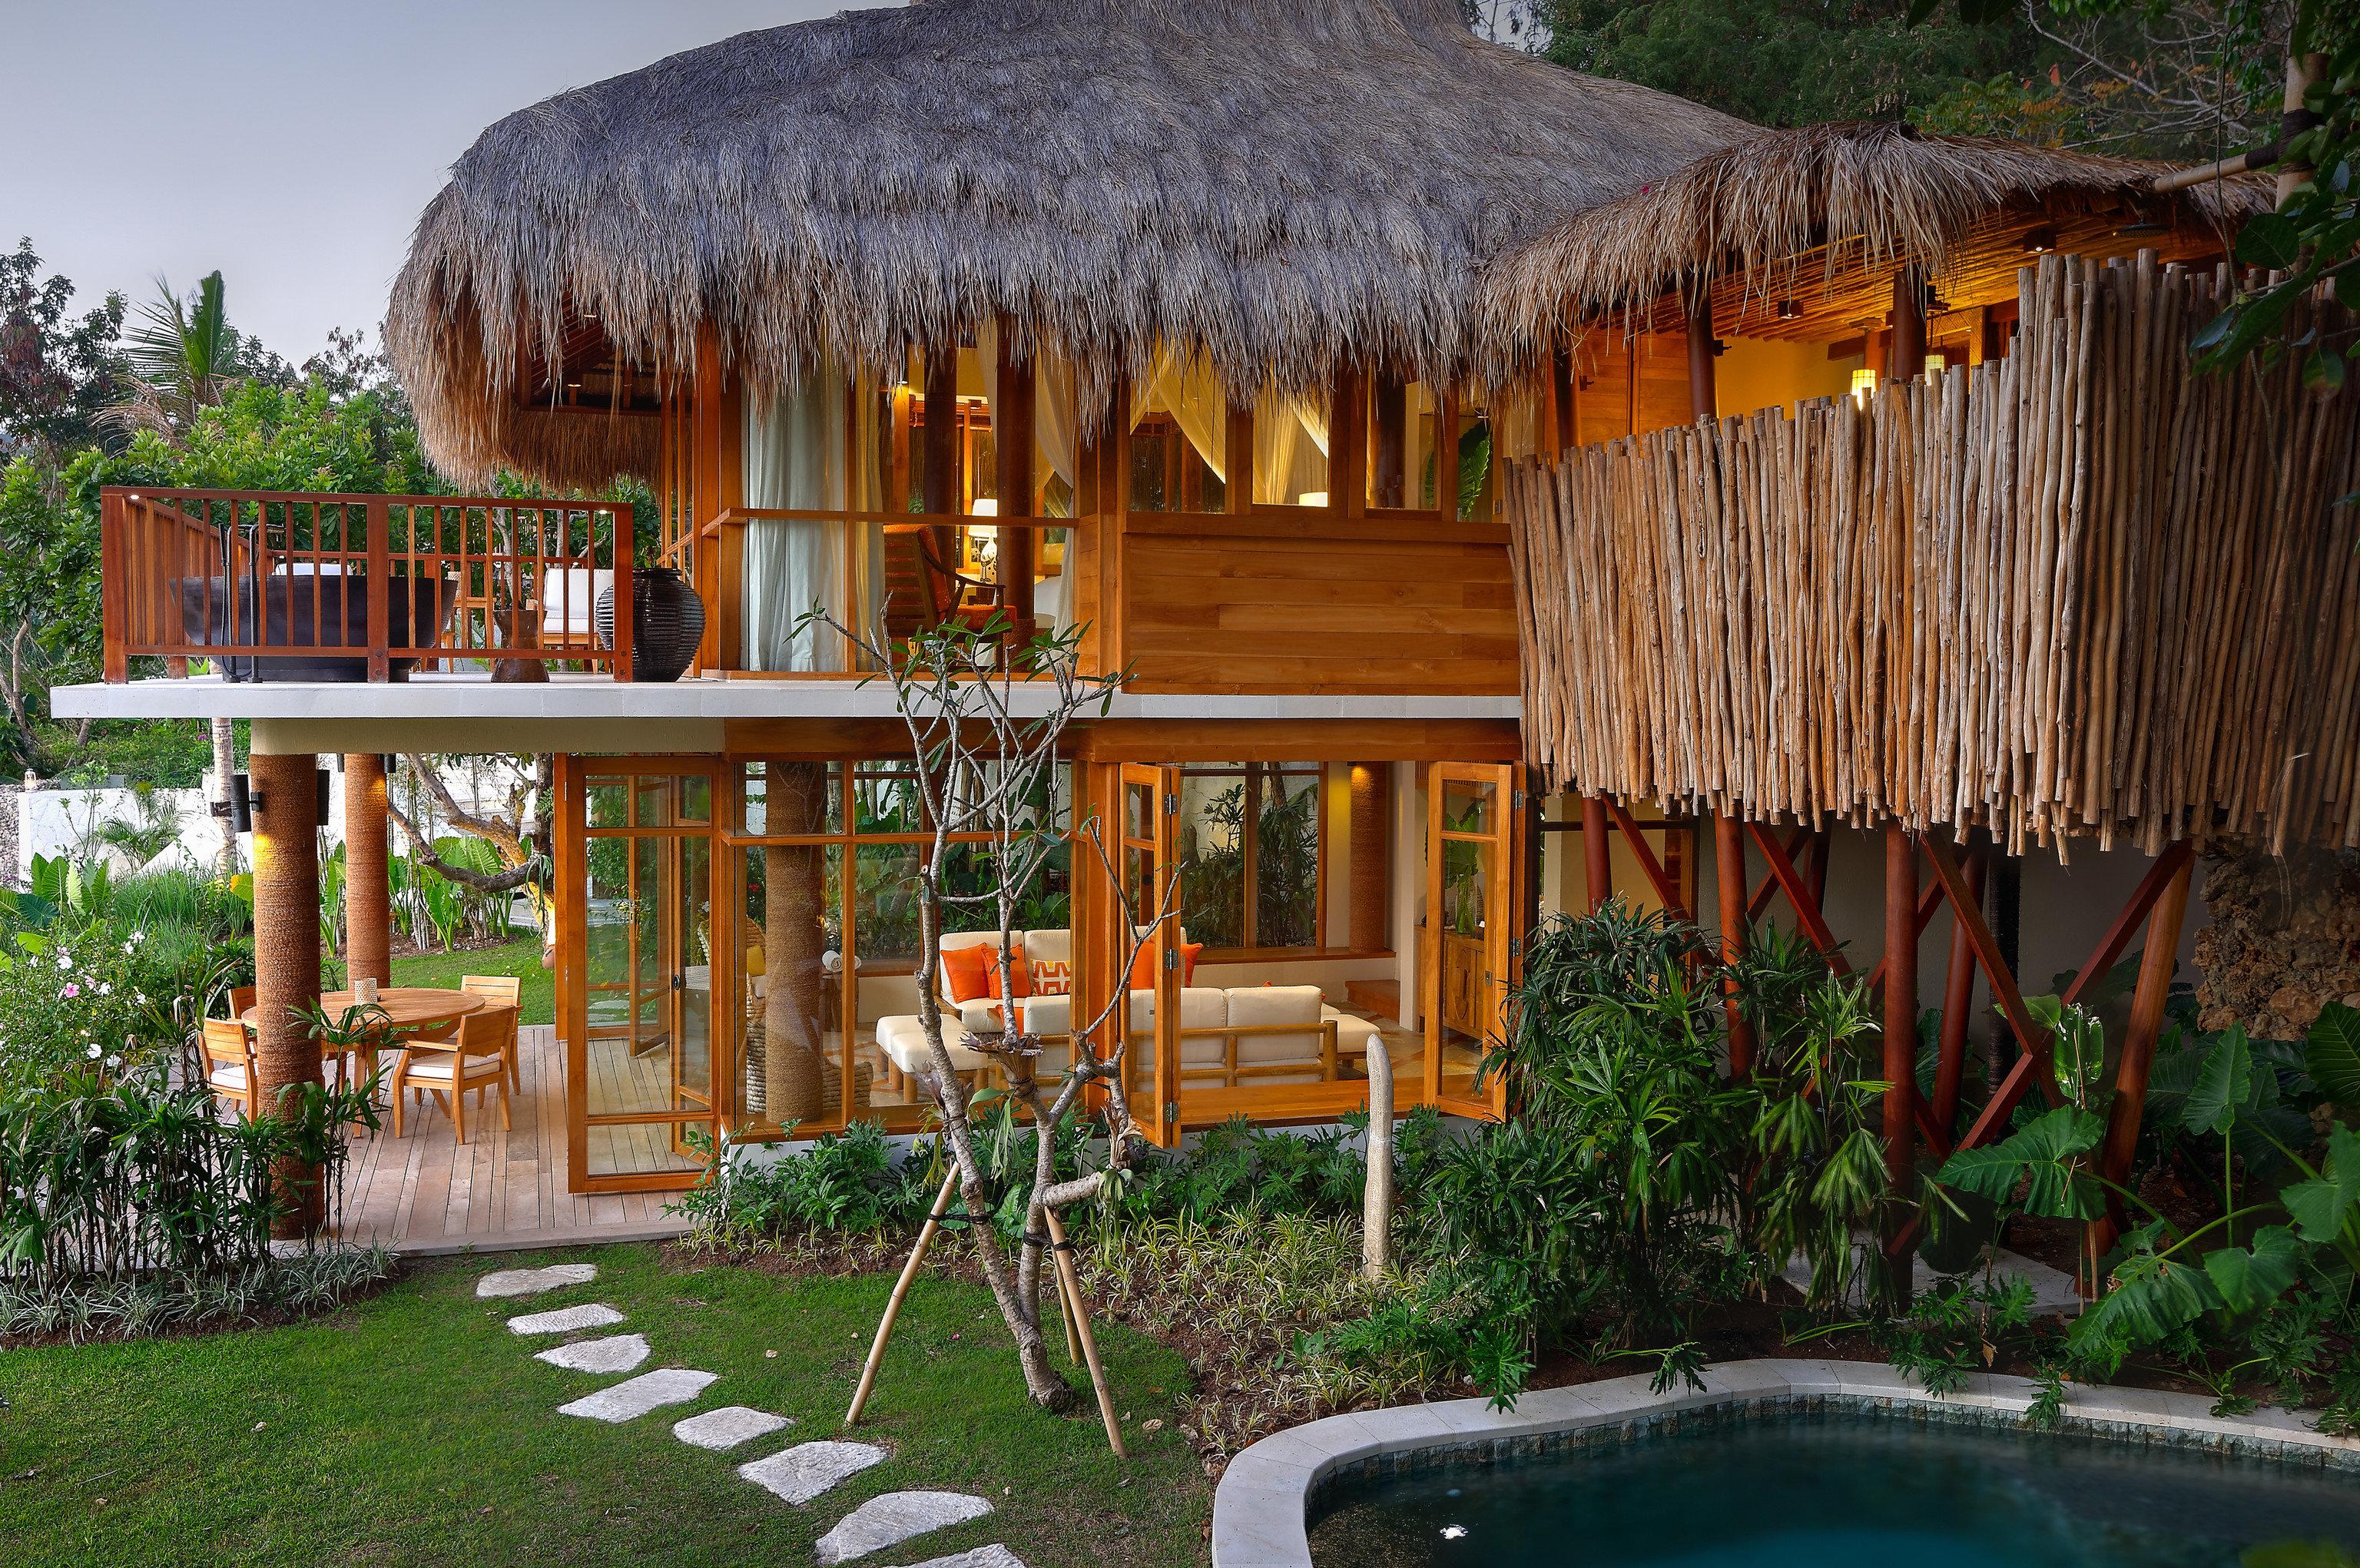 Beach Islands Luxury Travel Trip Ideas outdoor tree grass building house Resort estate hut backyard eco hotel Villa cottage lawn Jungle outdoor structure hacienda area